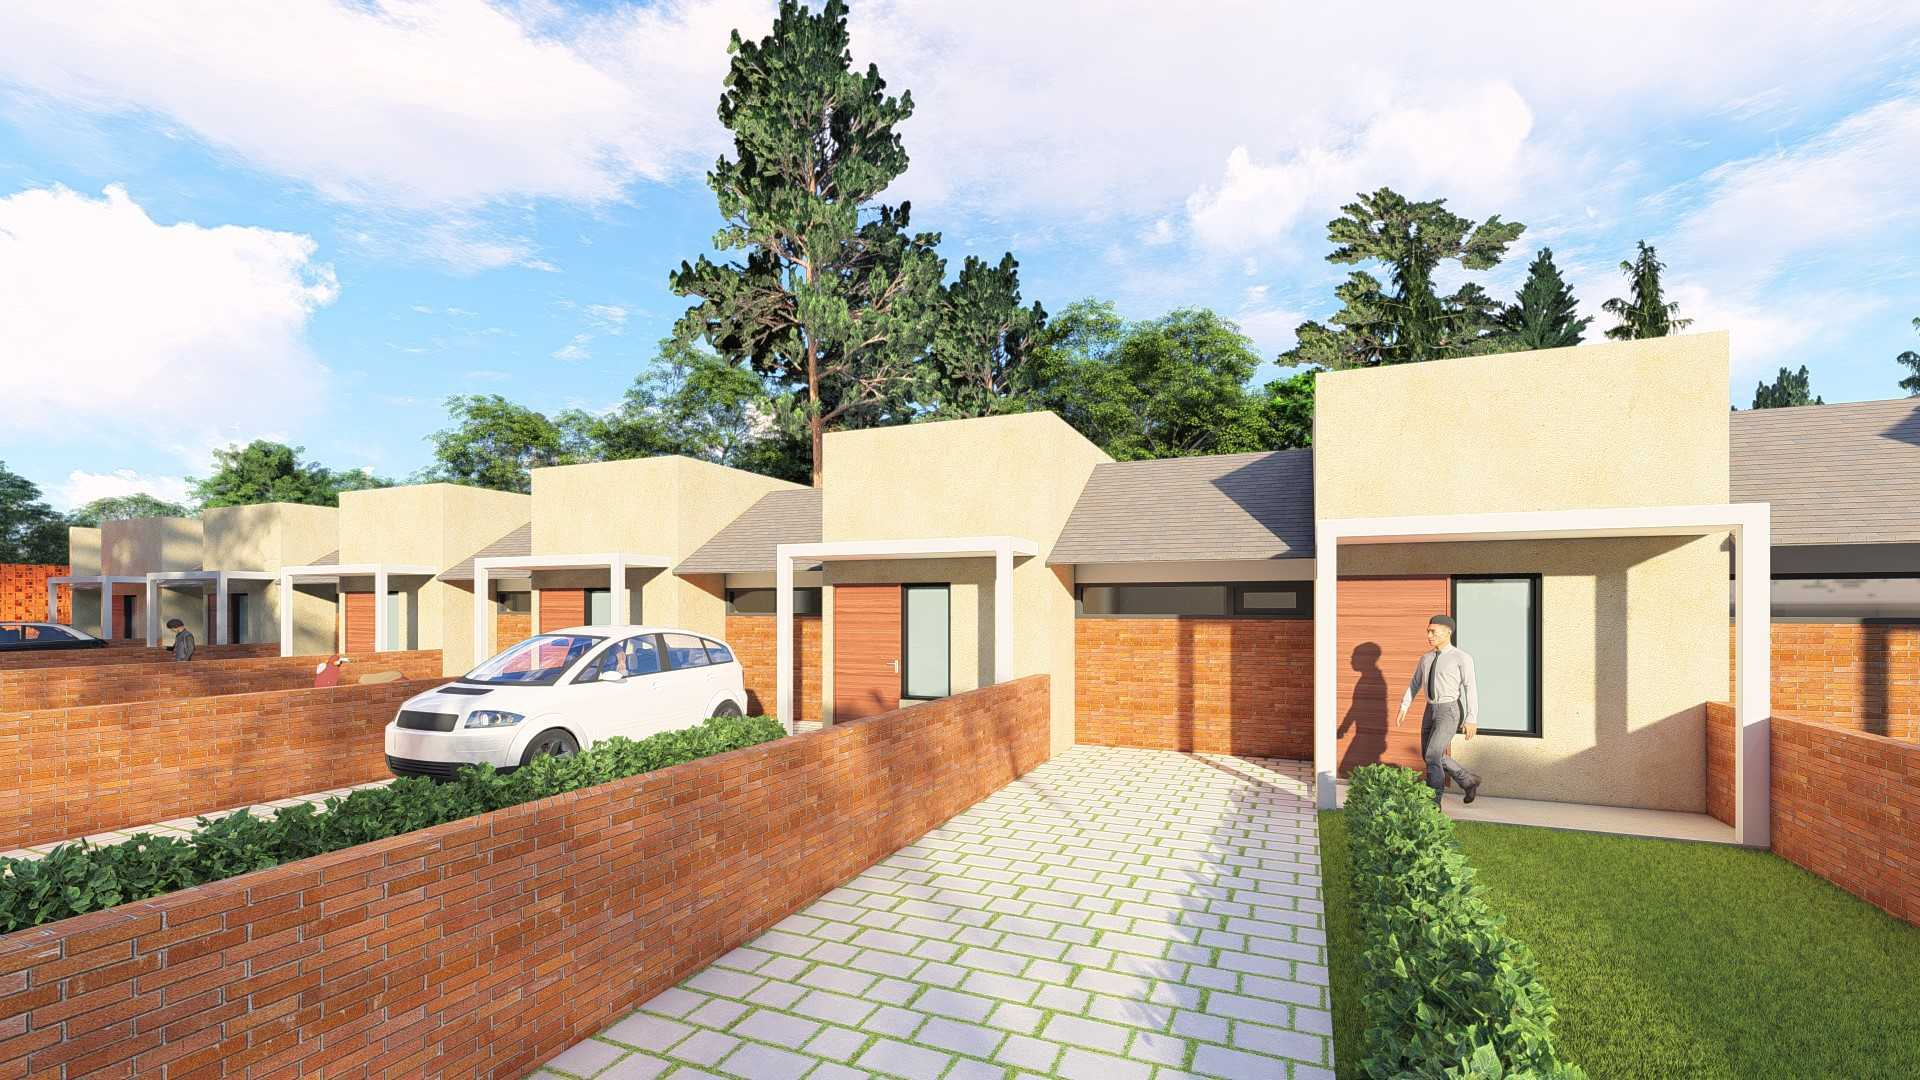 Artelier Cileunyi Residence Cileunyi, Bandung, Jawa Barat, Indonesia Cileunyi, Bandung, Jawa Barat, Indonesia Artelier-Cileunyi-Residence   67336